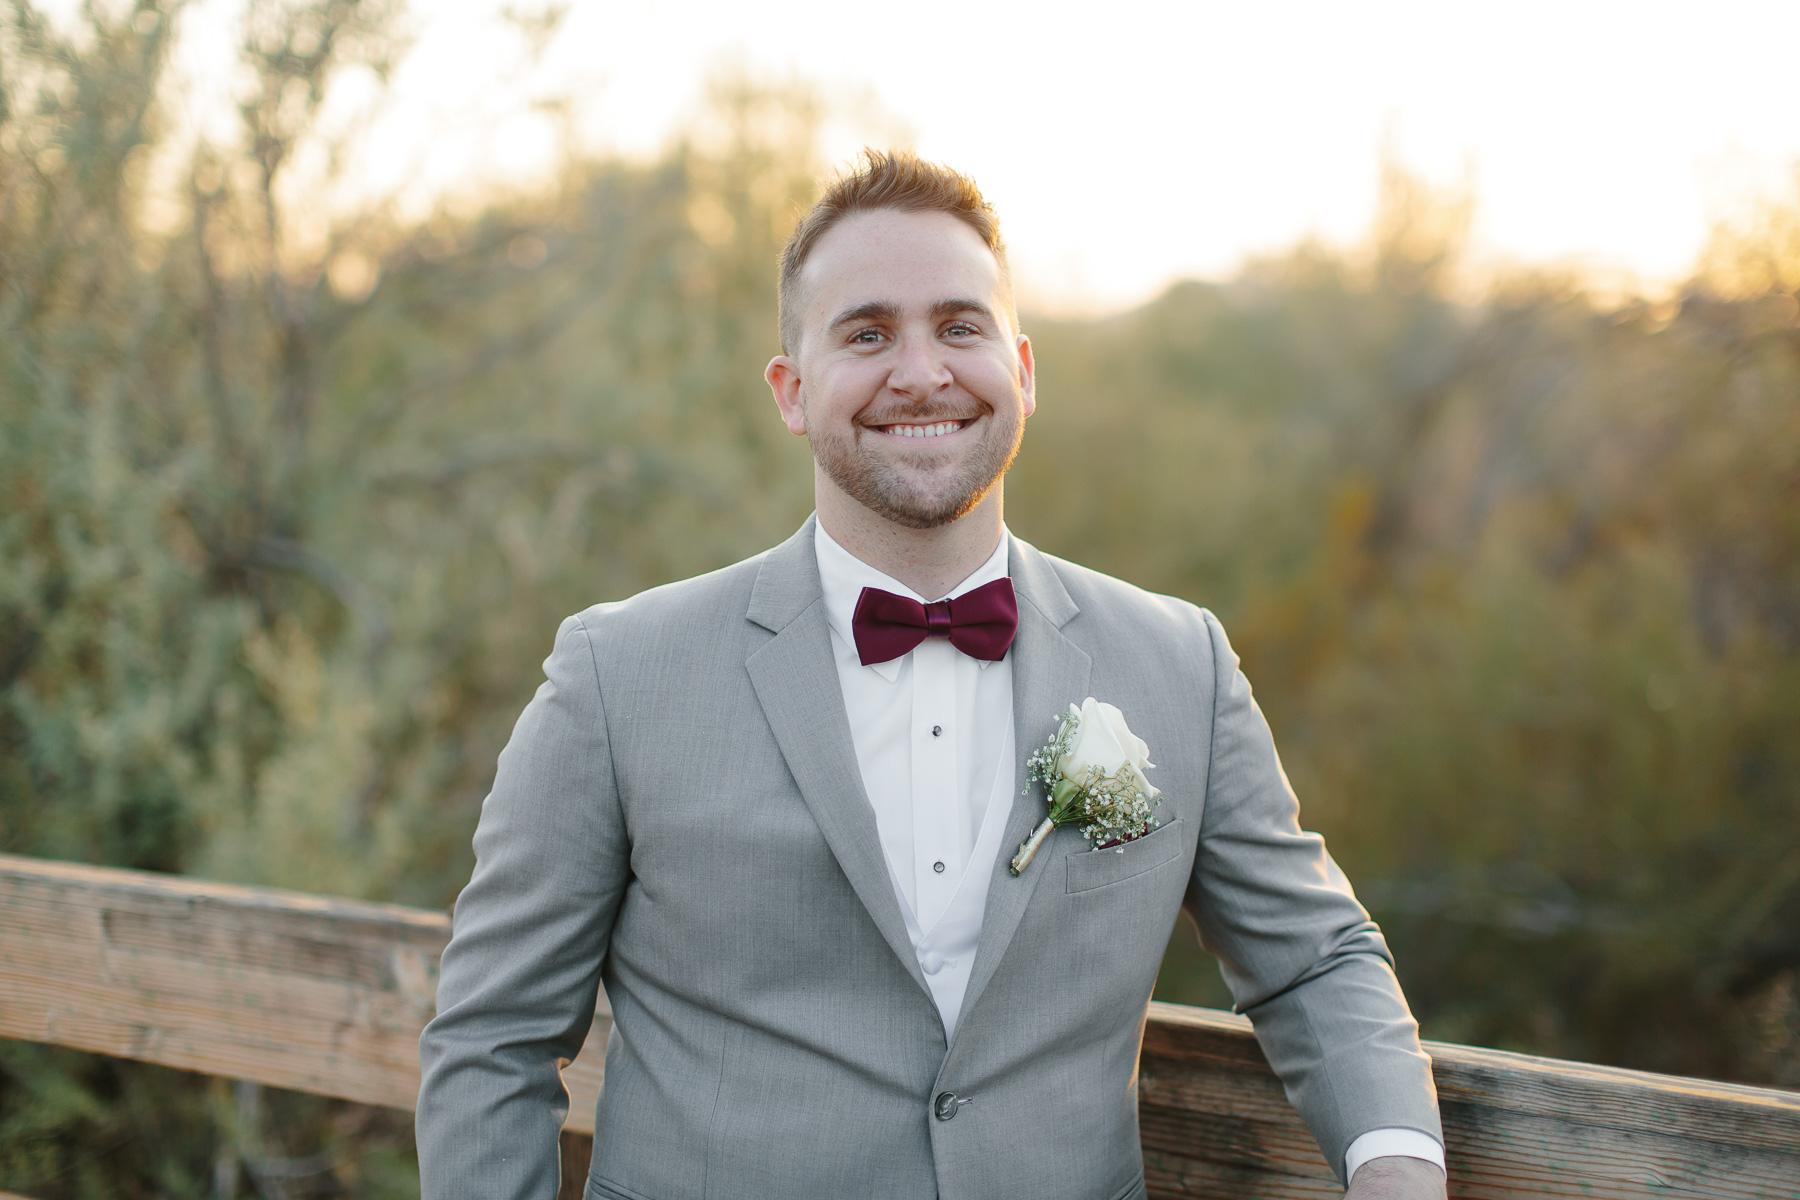 161210-Luxium-Weddings-Arizona-Matt-Jenny-Anthem-Golf-Country-Club-1055.jpg